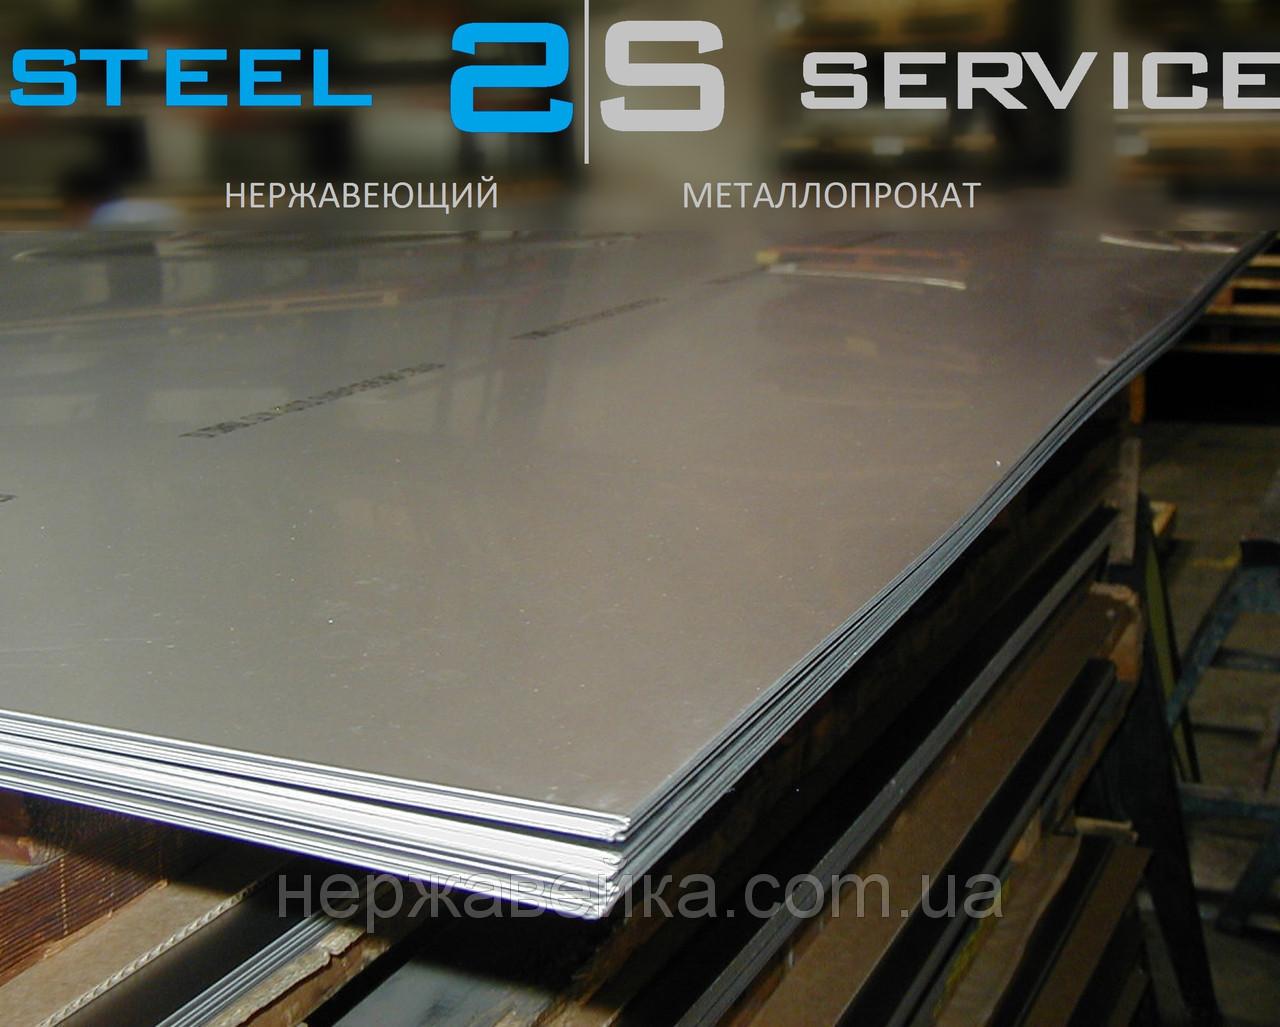 Нержавейка лист 2х1500х3000мм  AISI 316Ti(10Х17Н13М2Т) 2B - матовый,  кислотостойкий